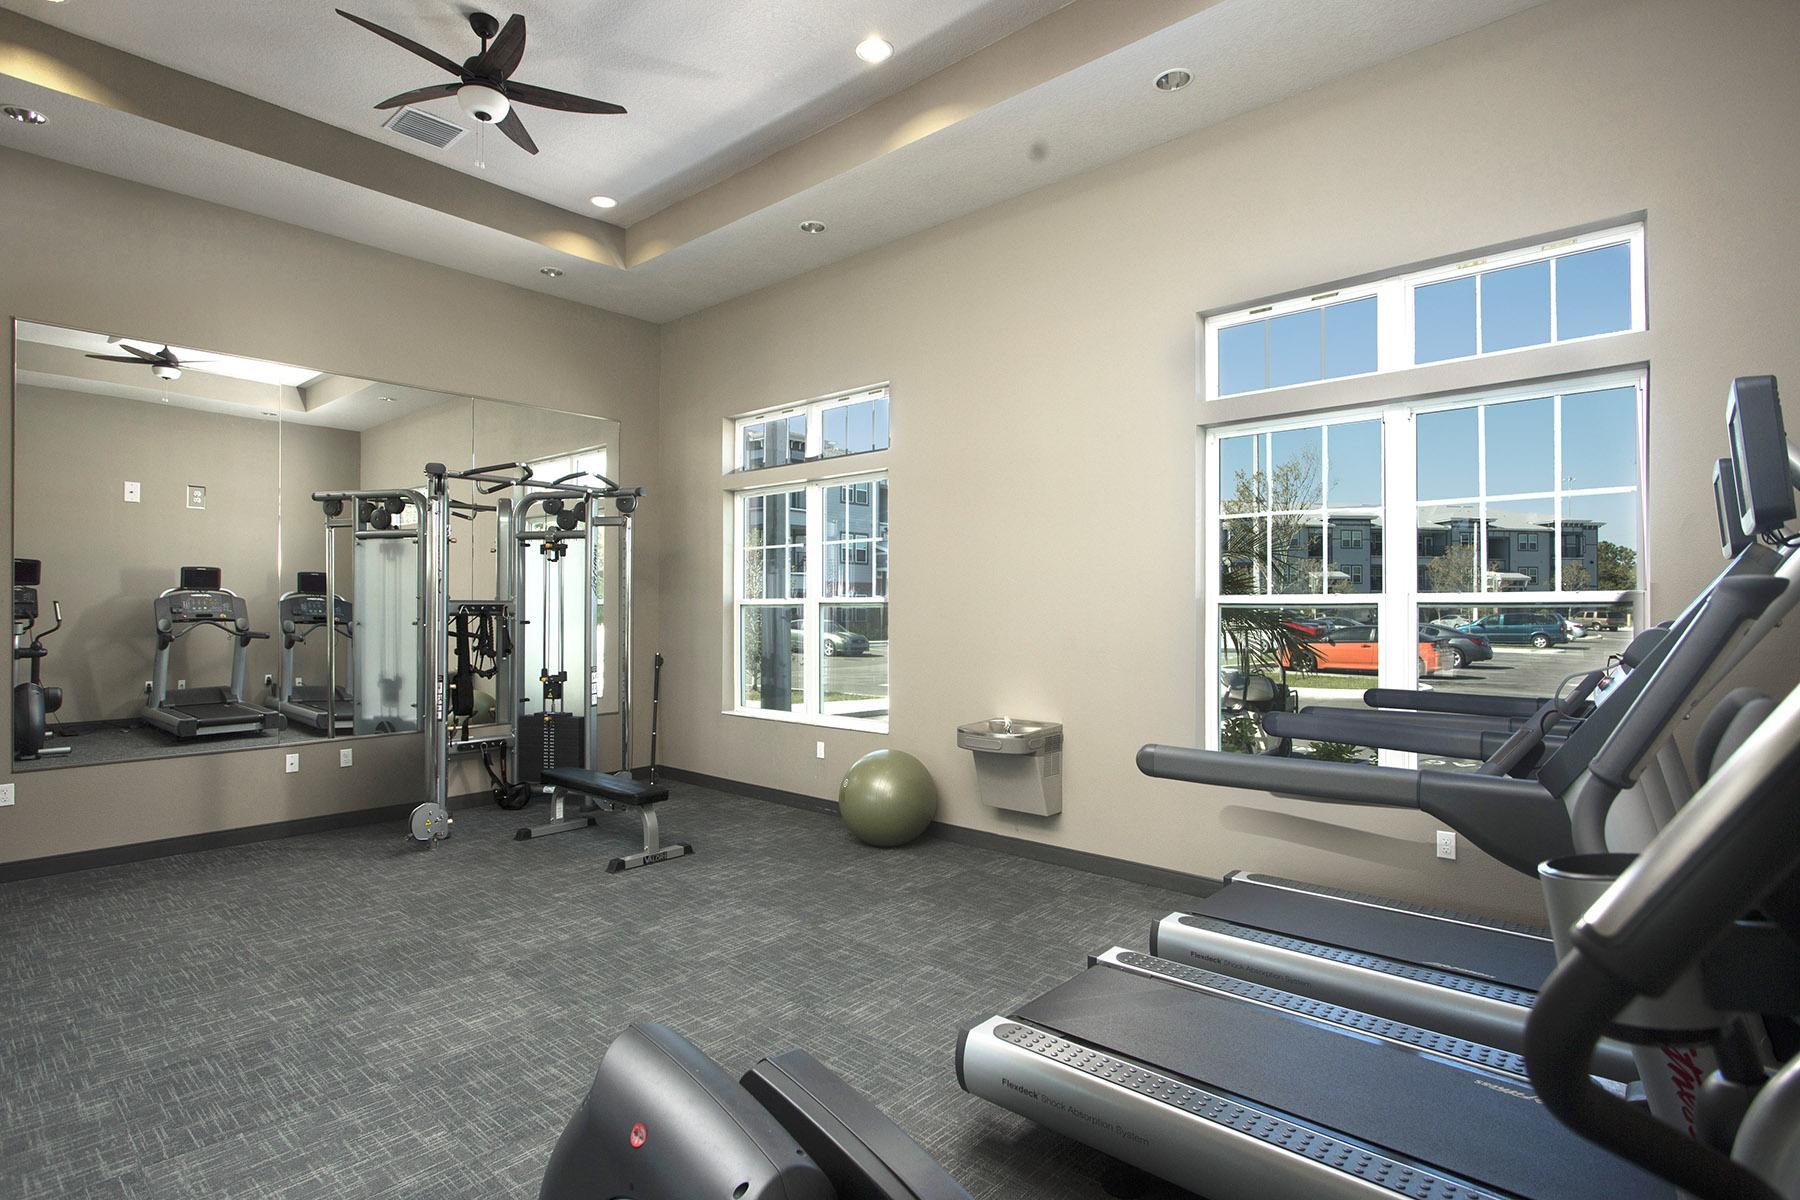 CharlestonEdge-Rental-Apartment-Brandon-Tampa-Florida-Pool-Bedrooms-Fitness-Center-Gym.jpg